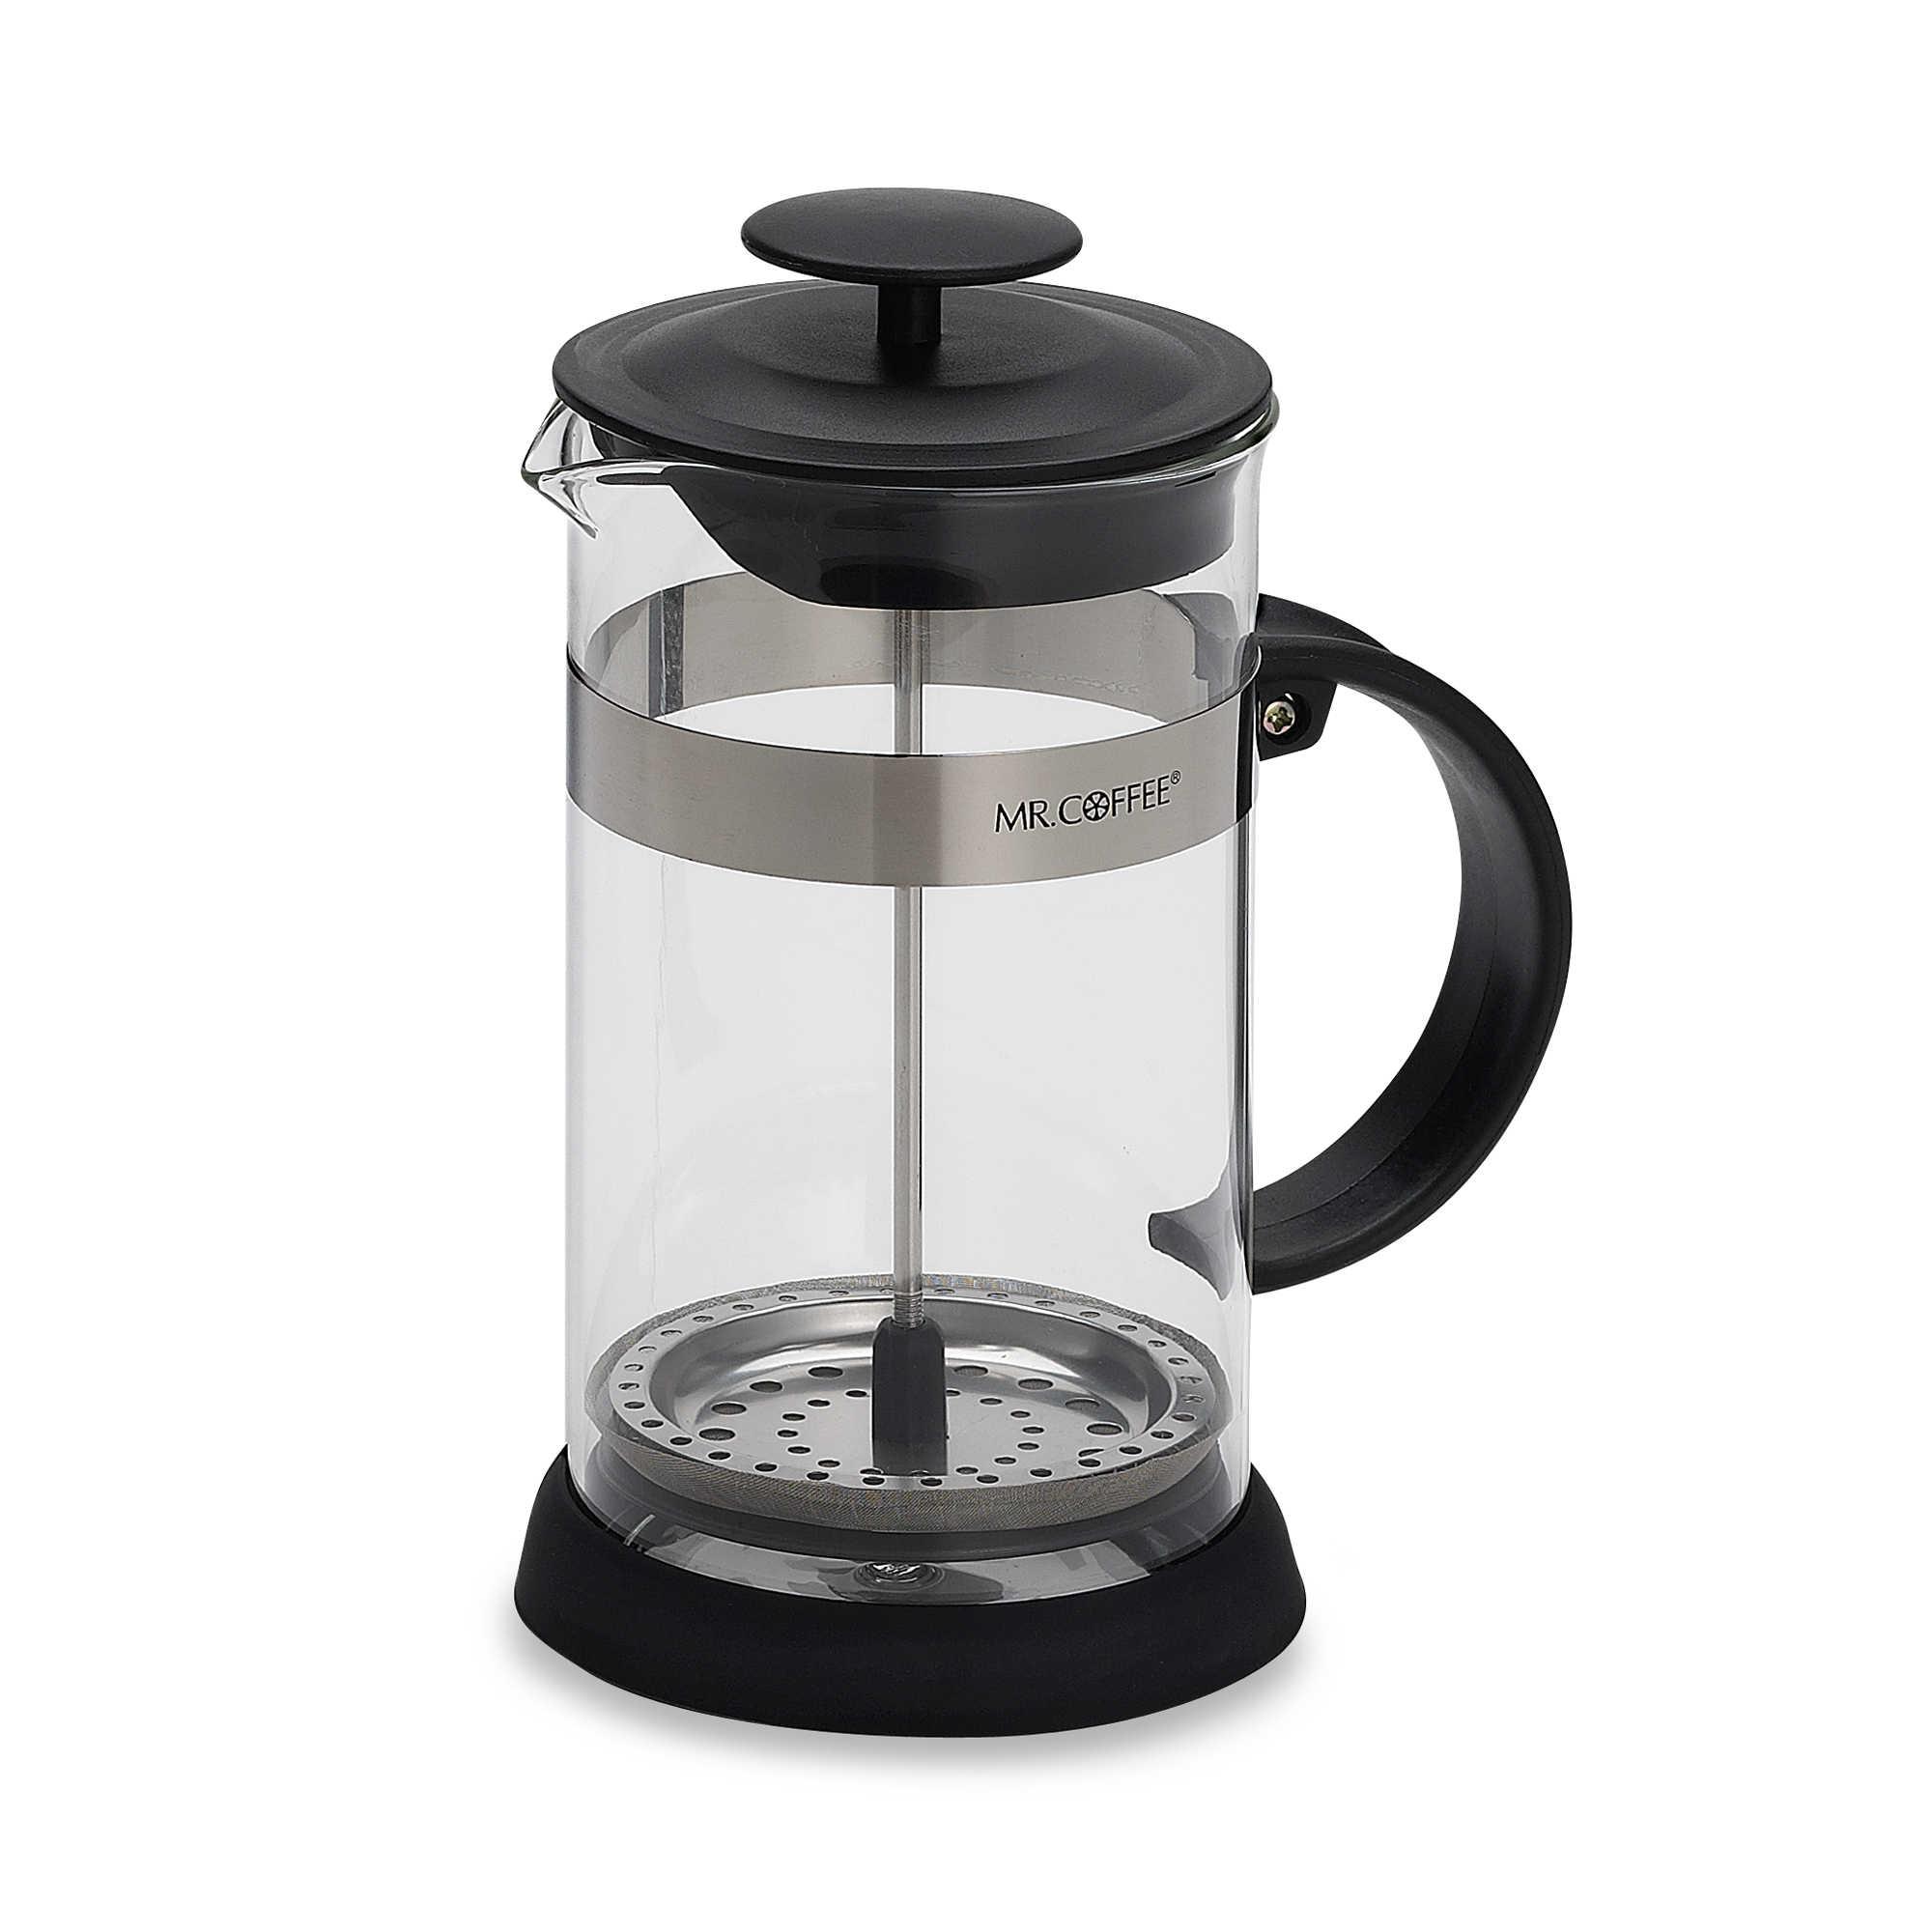 Bed bath beyond french press - Mr Coffee Reg 4 Cup Coffee Press In Black